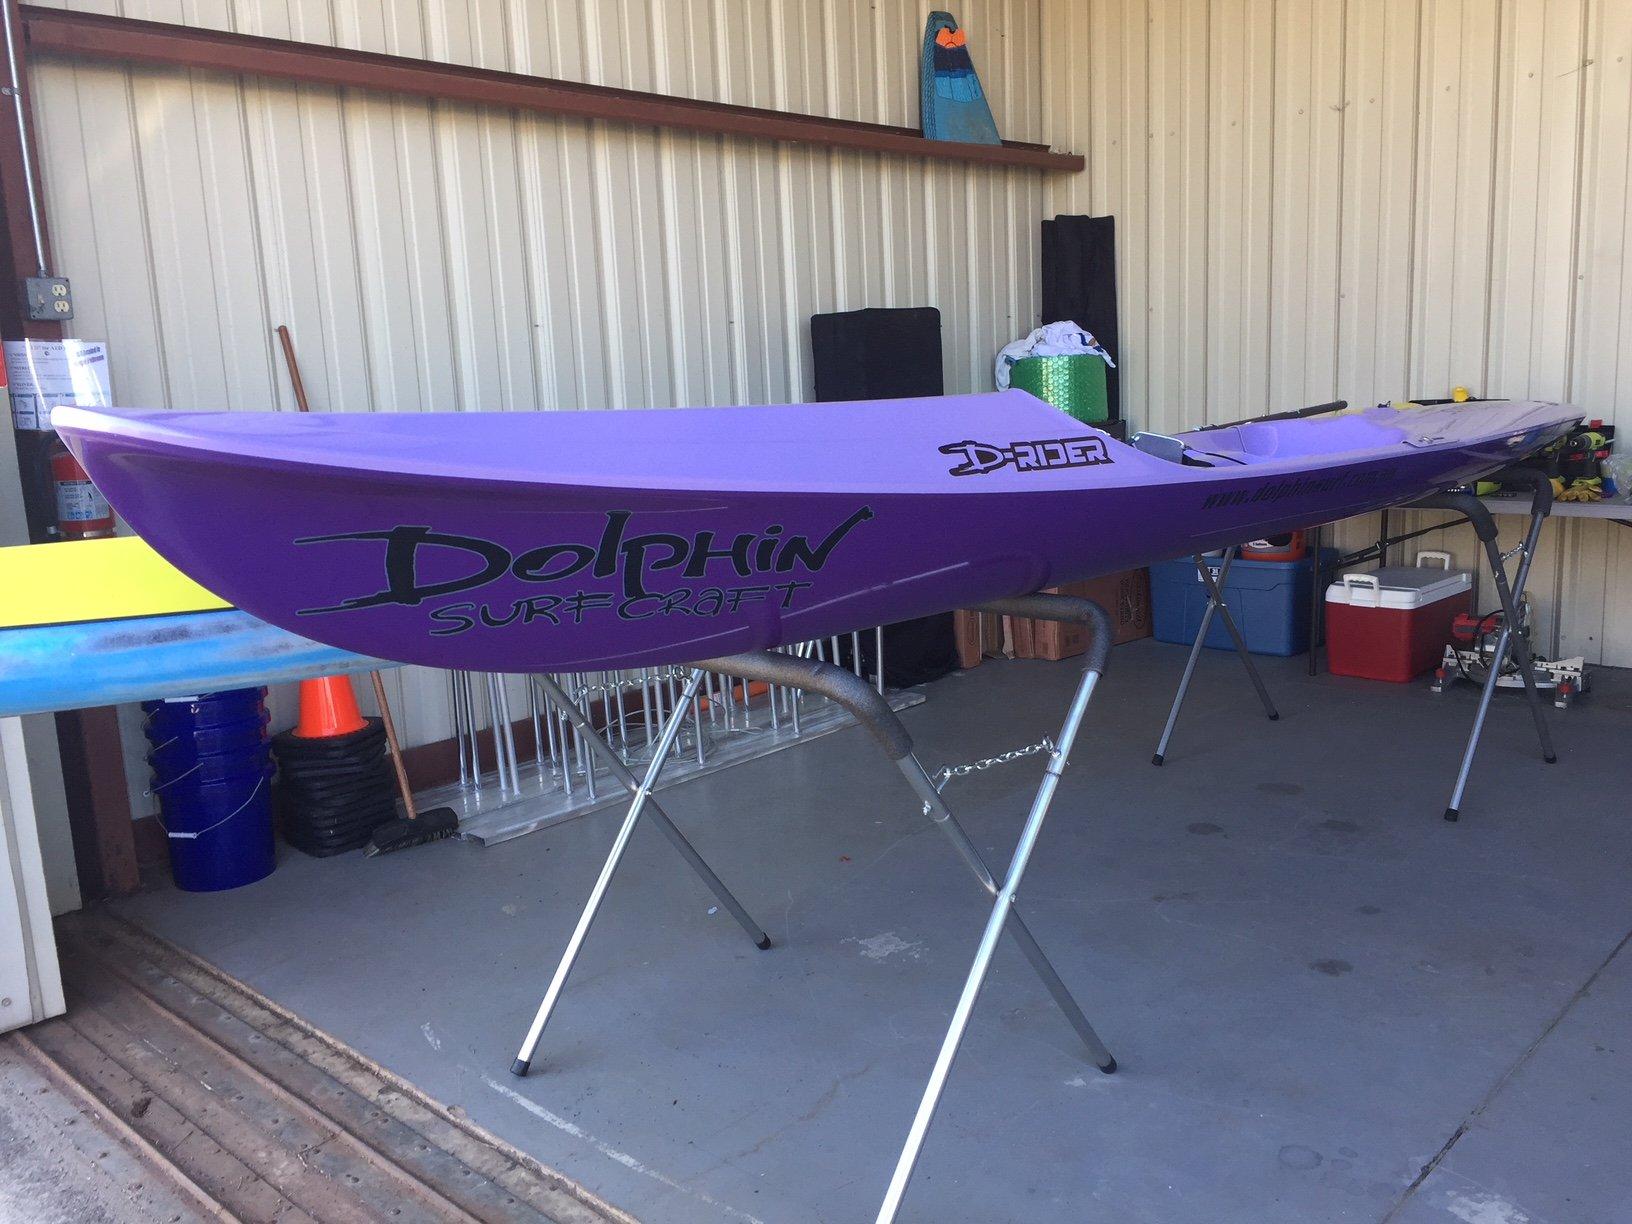 Dolphin D-Rider Surf Ski 17'